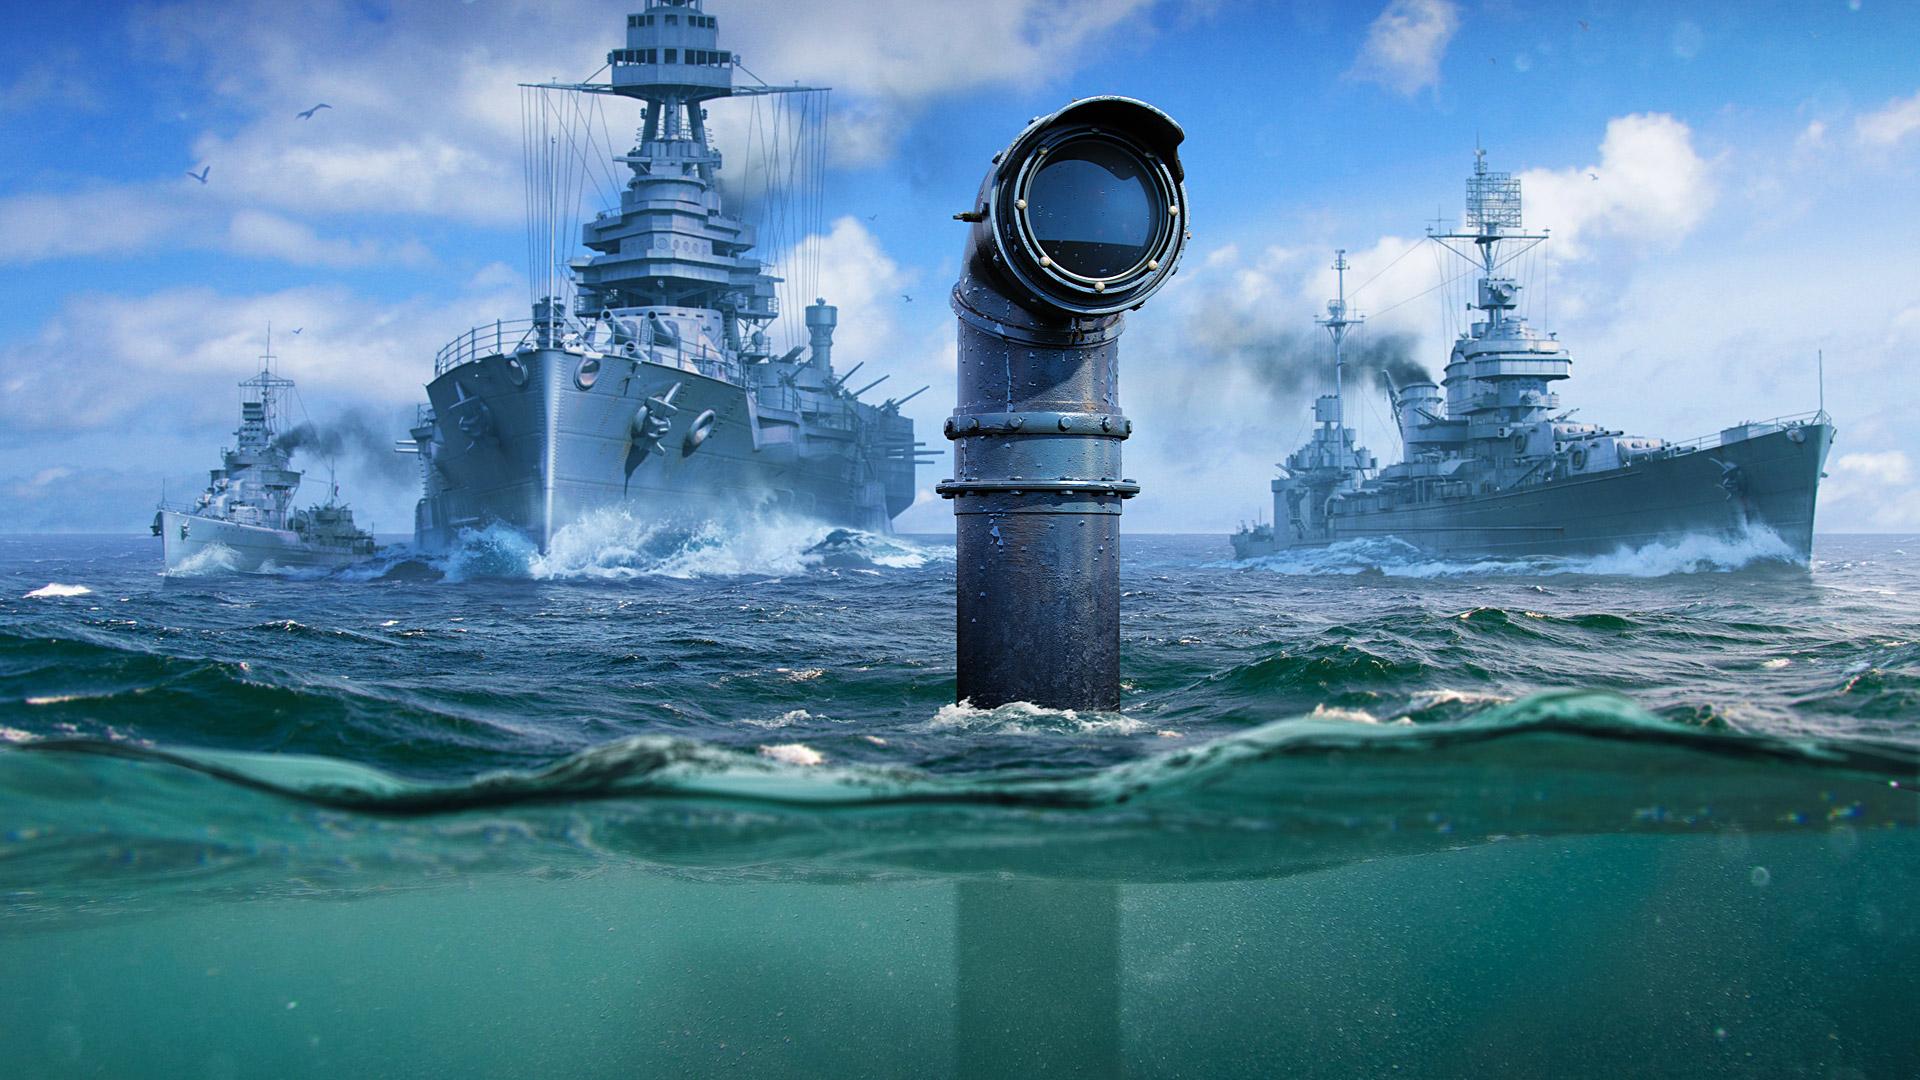 wallpapersden.com_world-of-warships-submarine_1920x1080